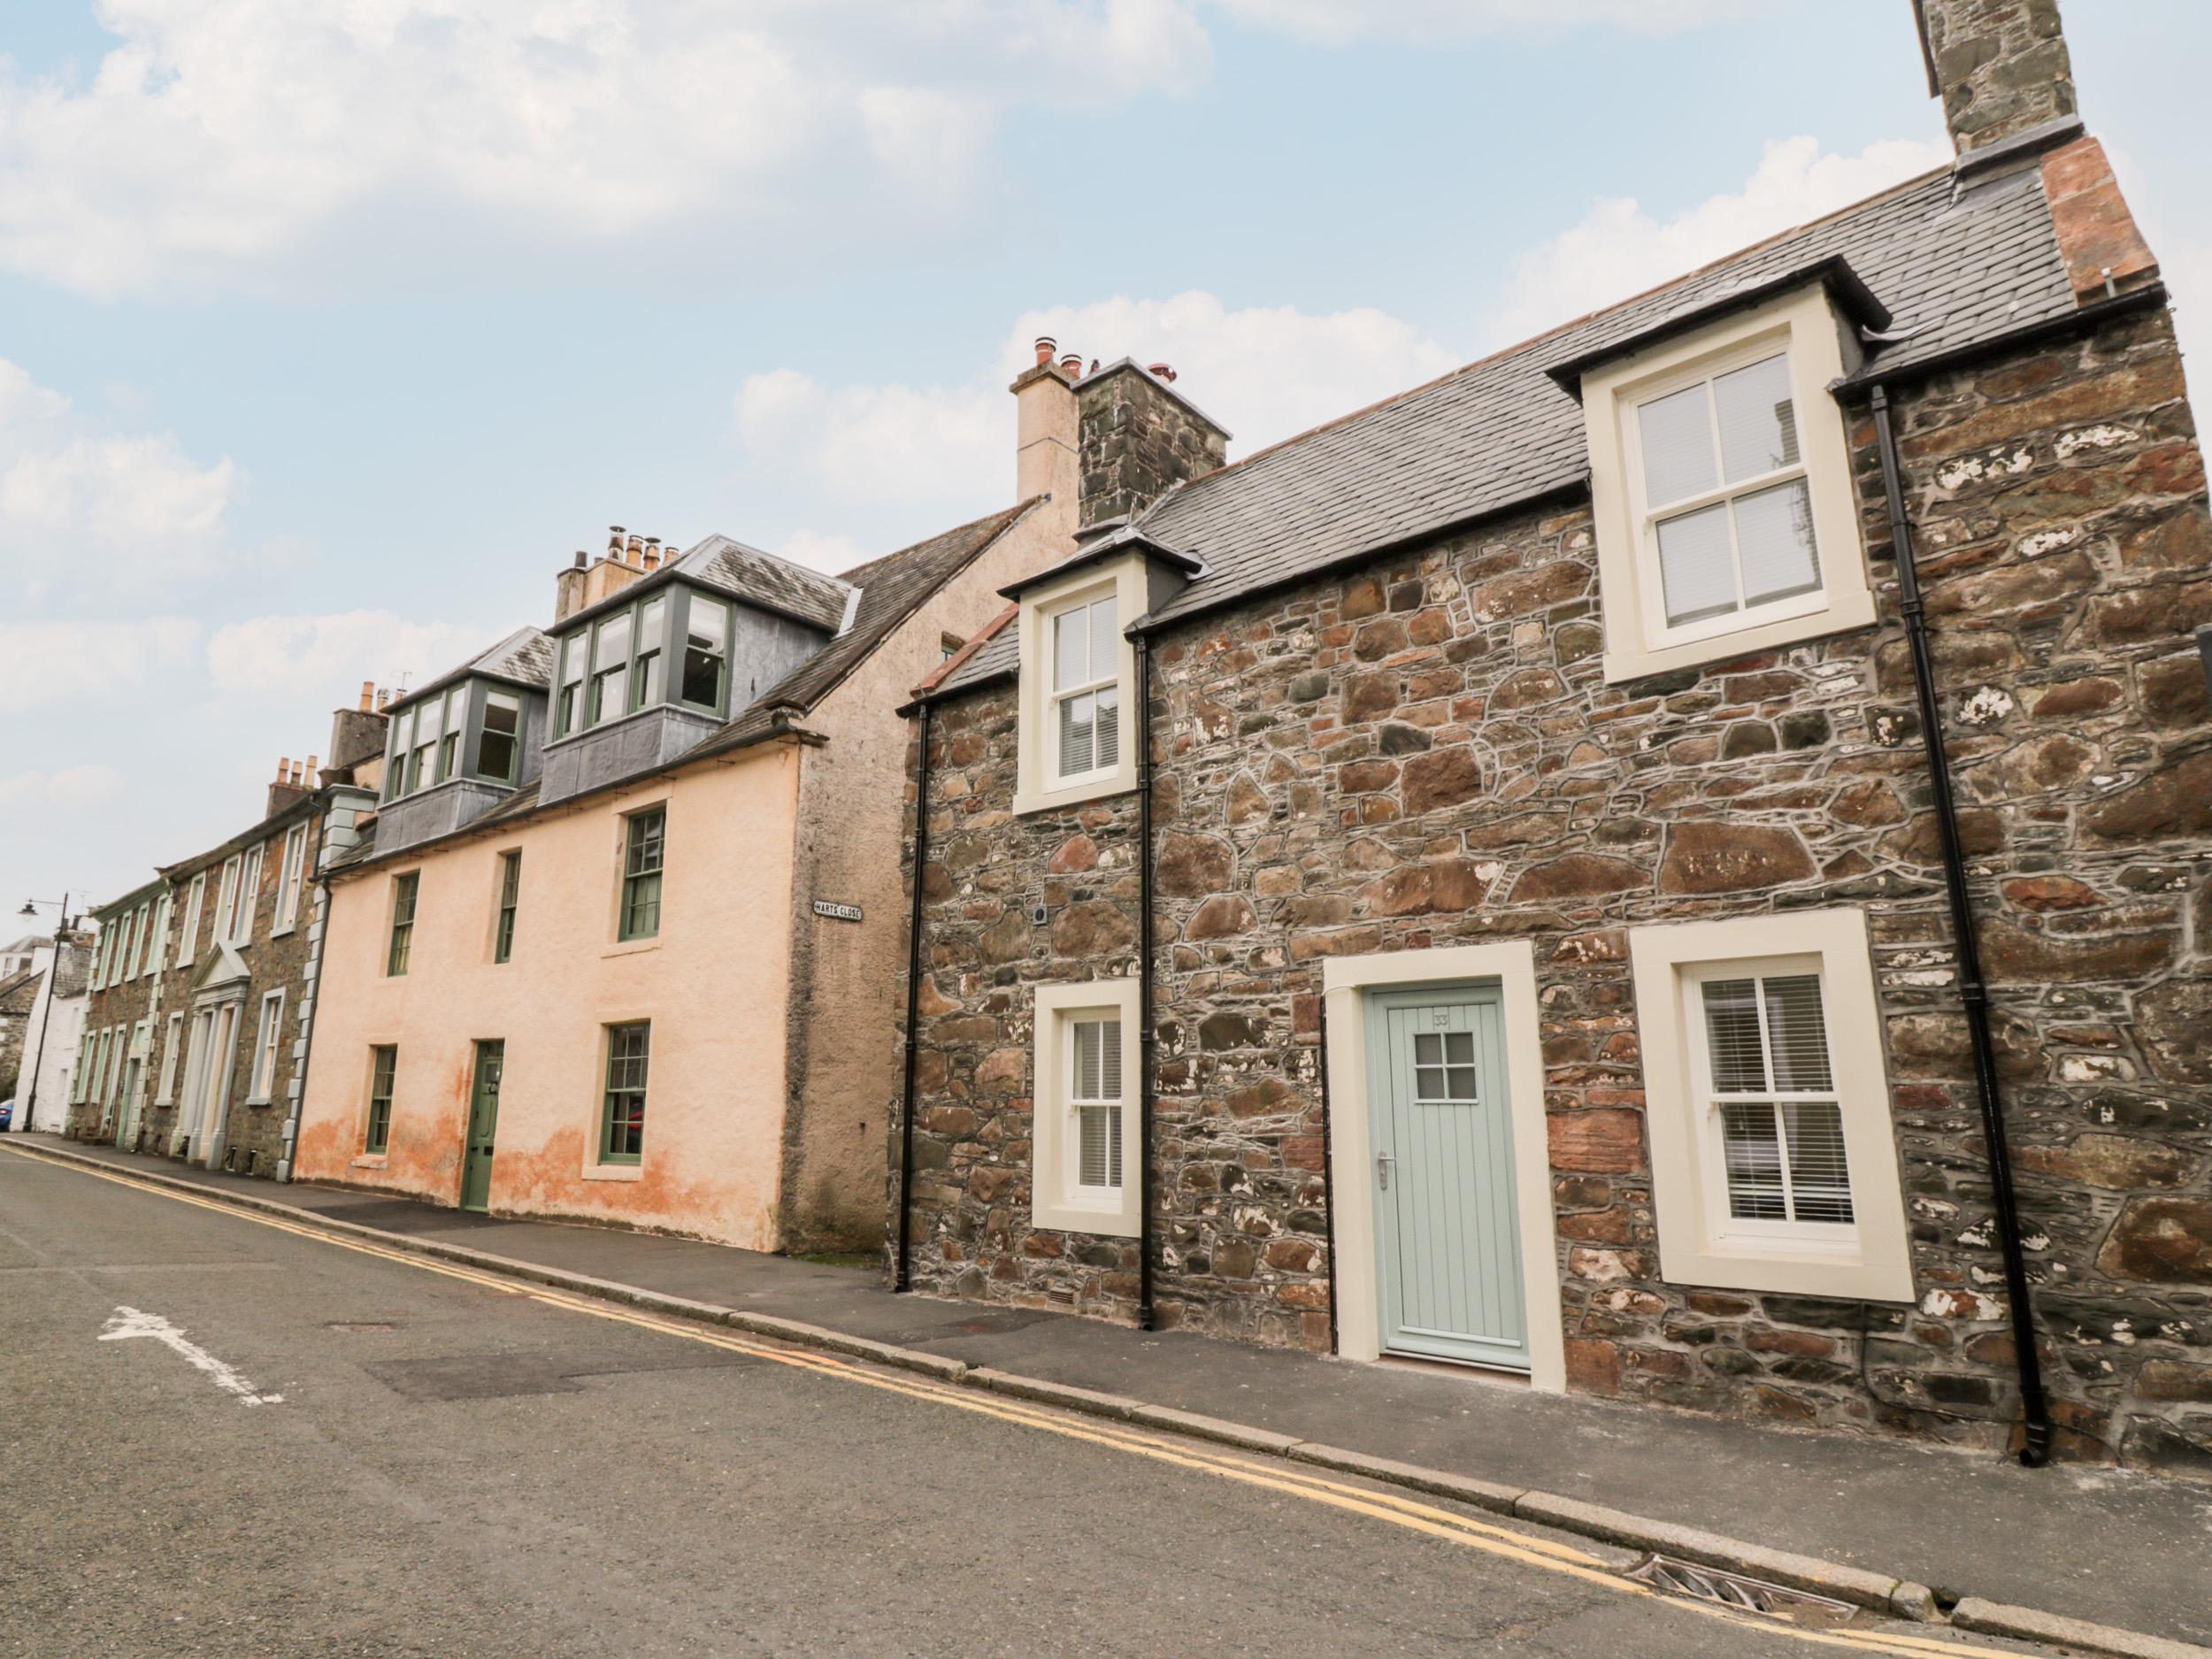 Harts Cottage